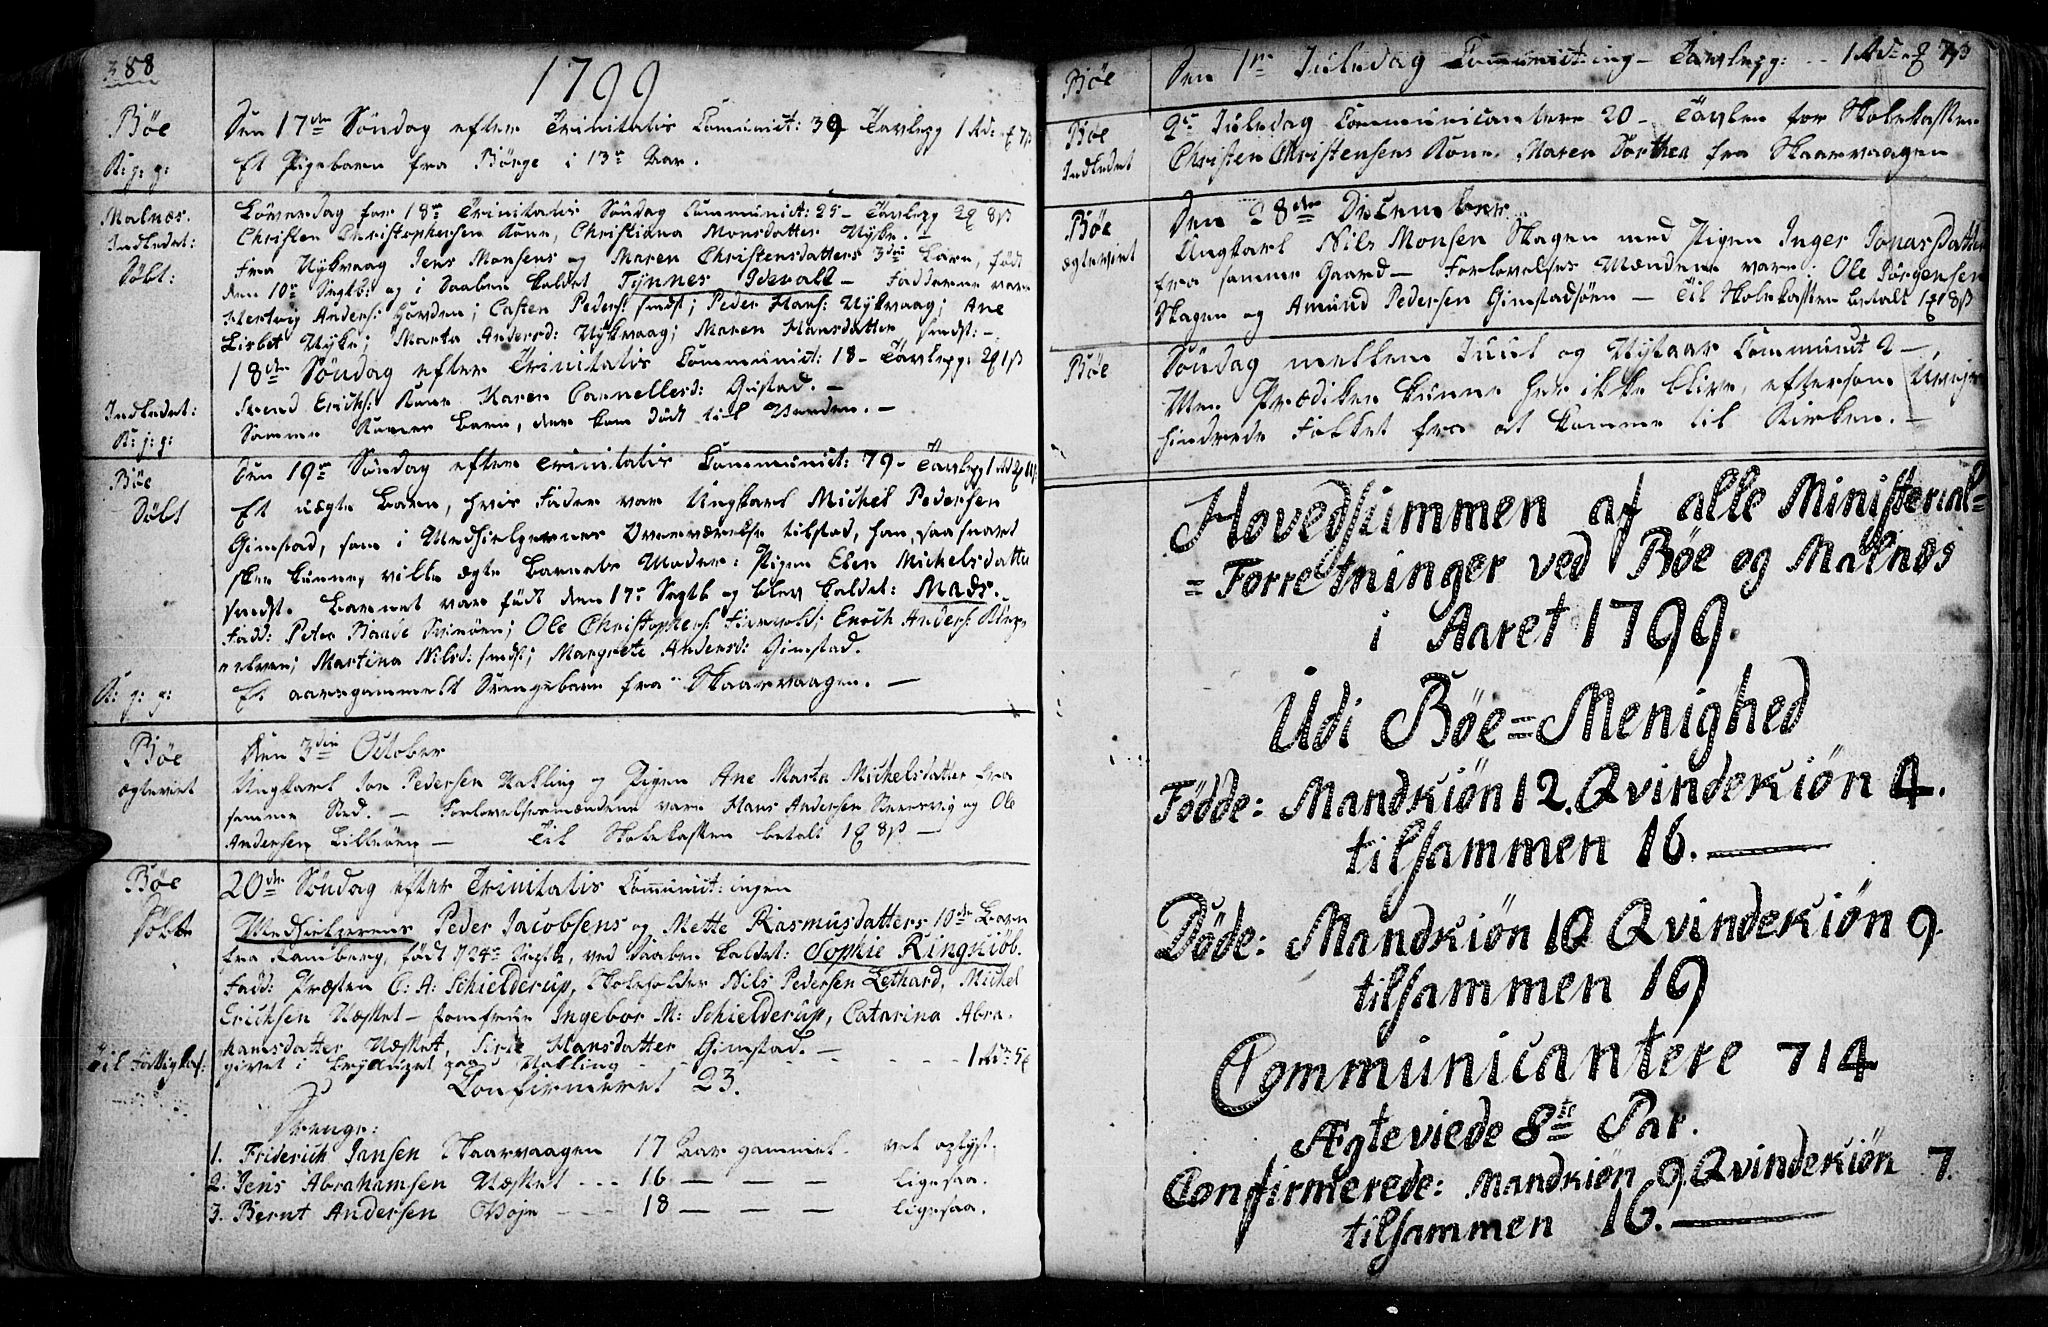 SAT, Ministerialprotokoller, klokkerbøker og fødselsregistre - Nordland, 891/L1297: Ministerialbok nr. 891A02, 1759-1820, s. 488-489